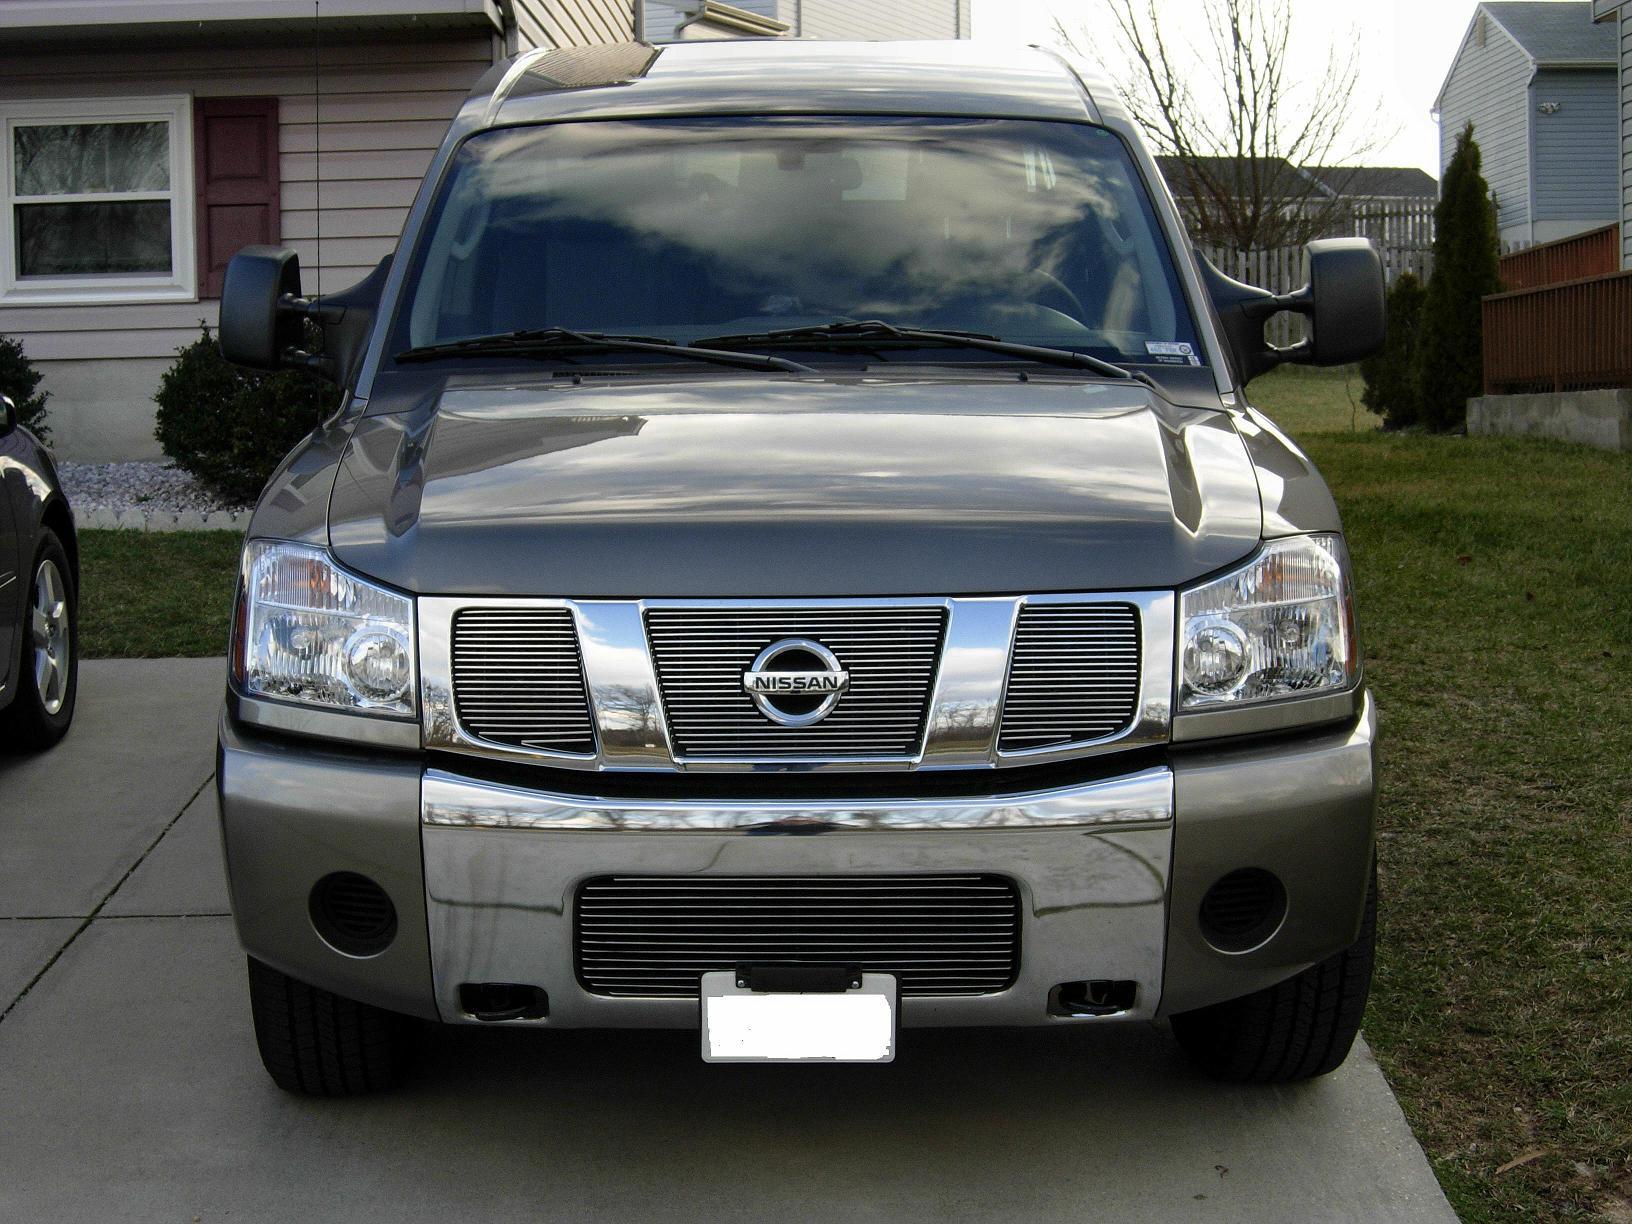 nj license plate mounting problem | Nissan Titan Forum